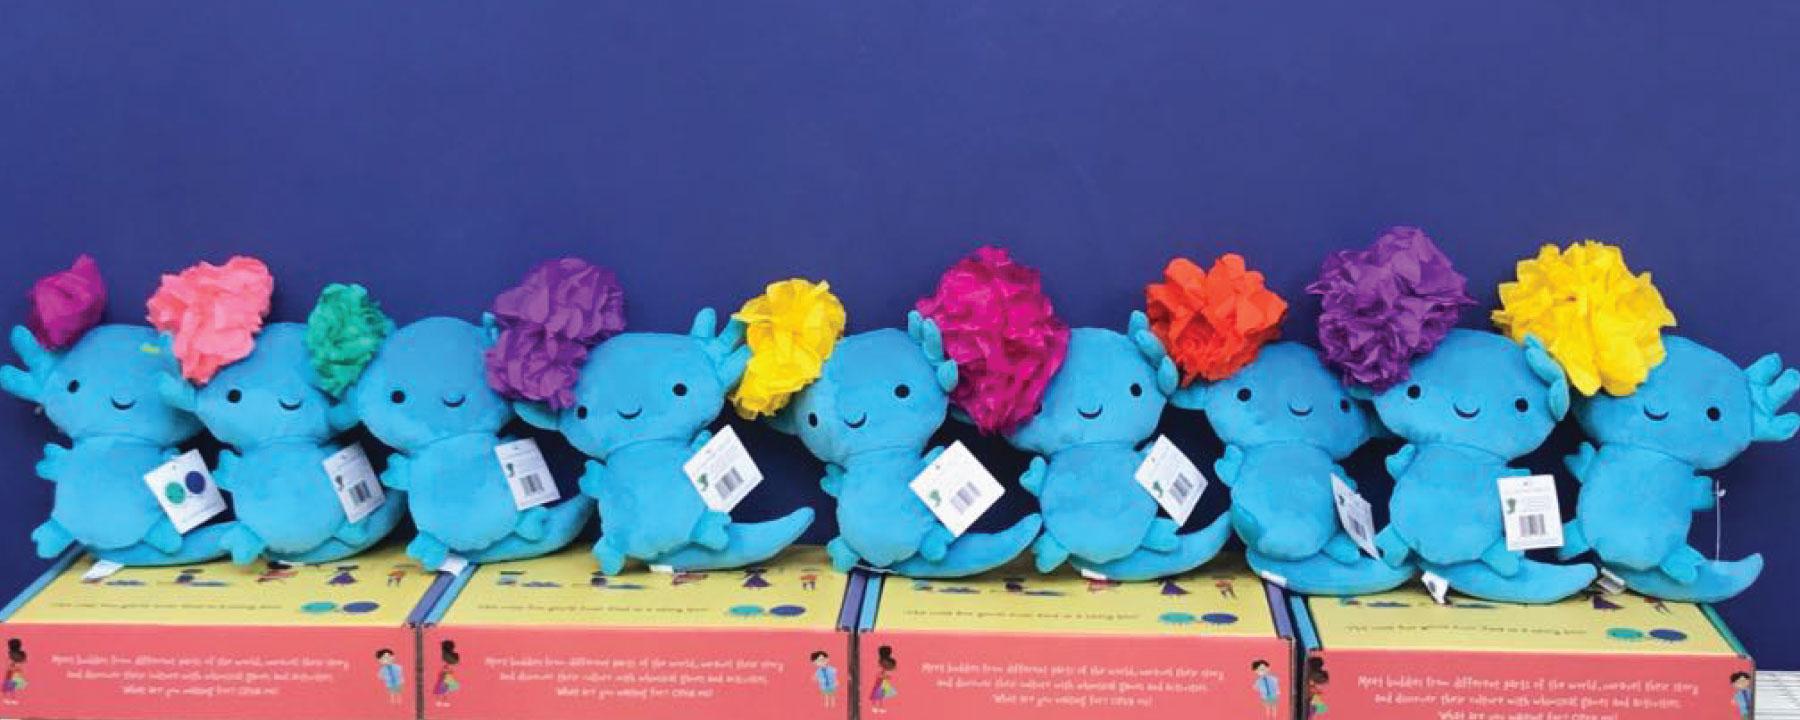 worldwide_buddies_axolotl_plush_toys.jpg